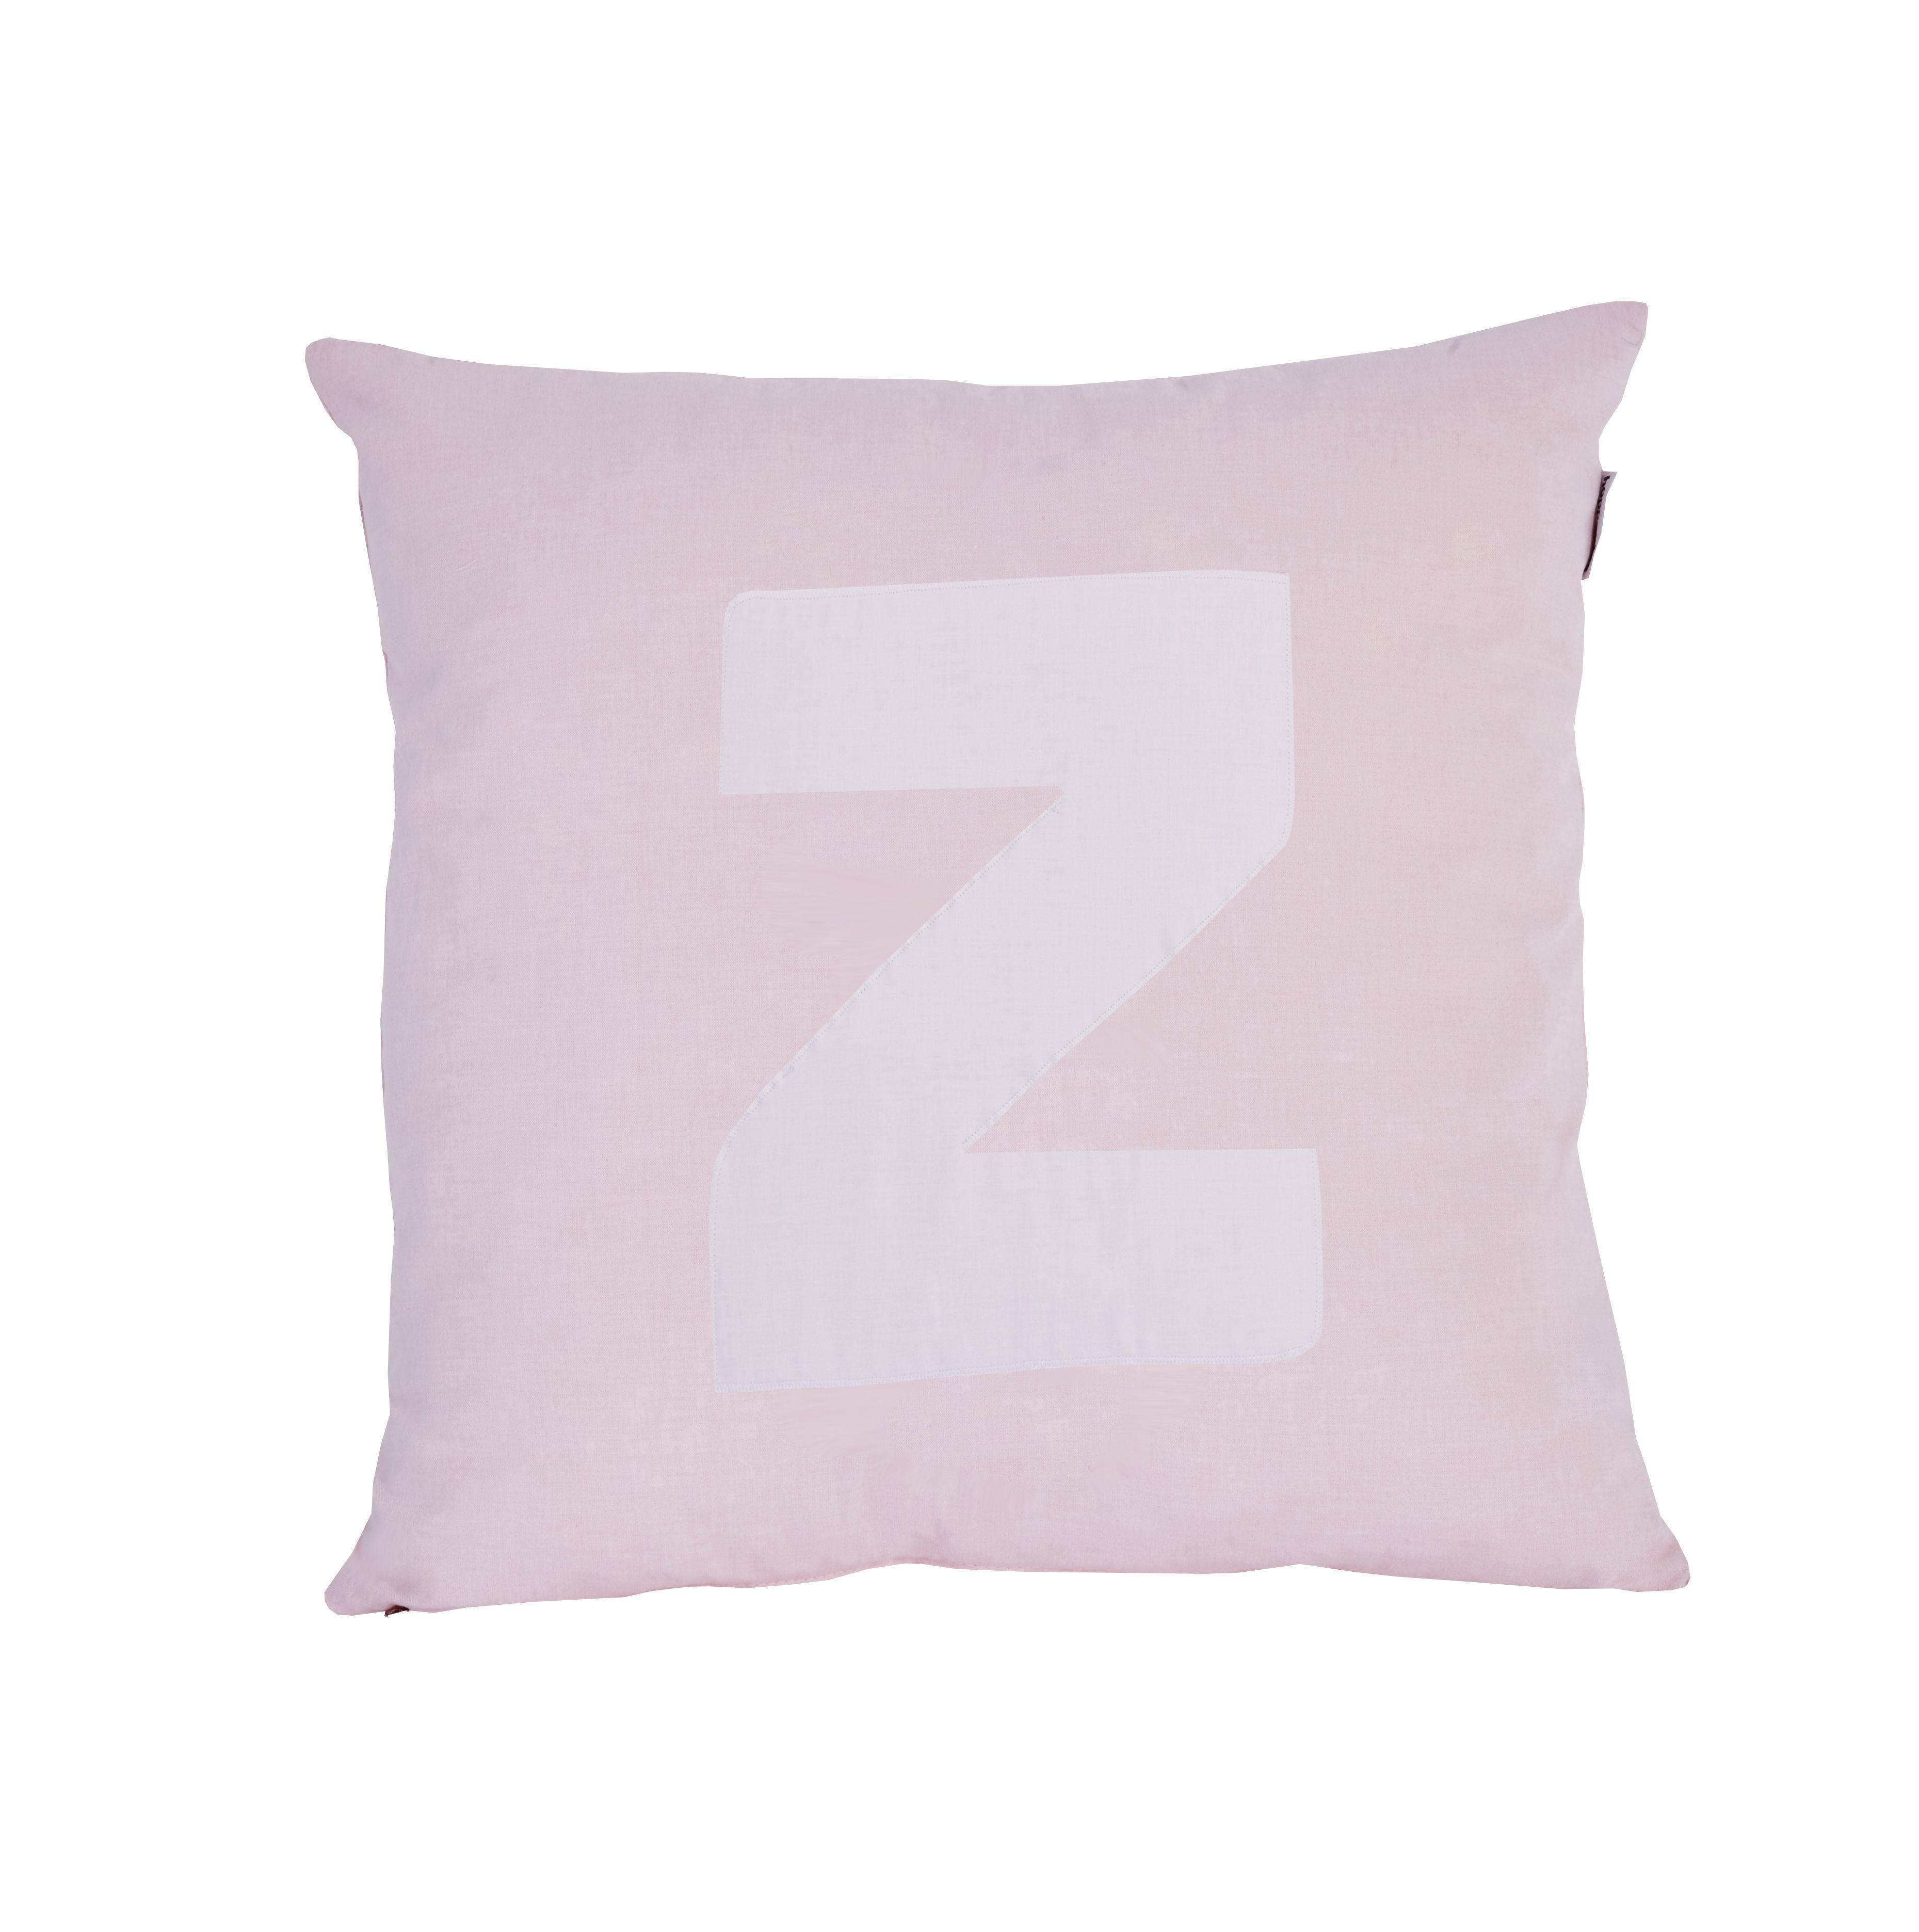 Pude Alphabet z lyserød fra Hoppekids